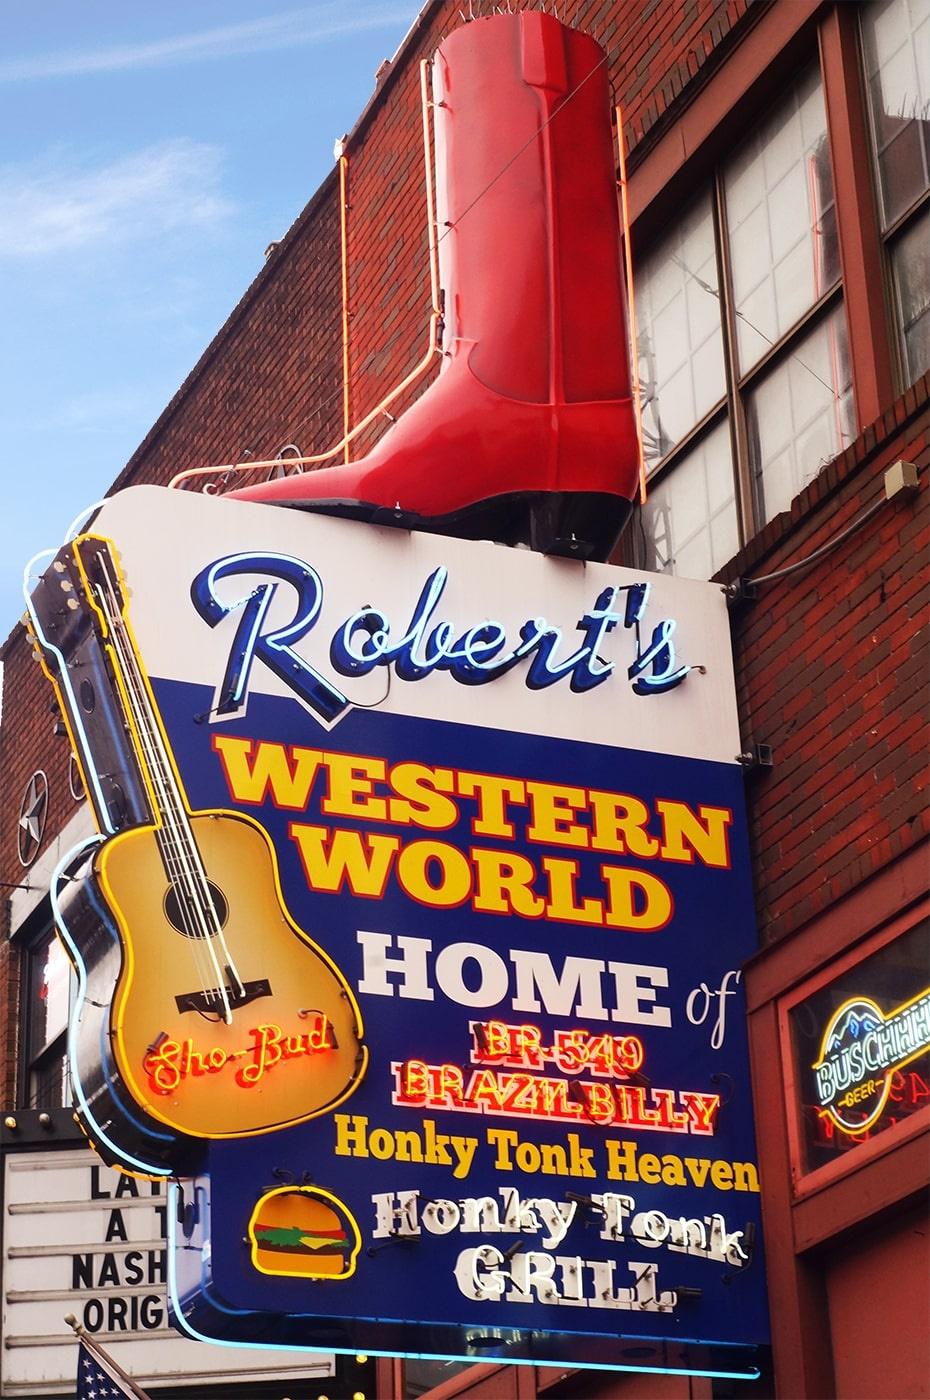 Robert's Western World; Photo courtesy of Music City Media House